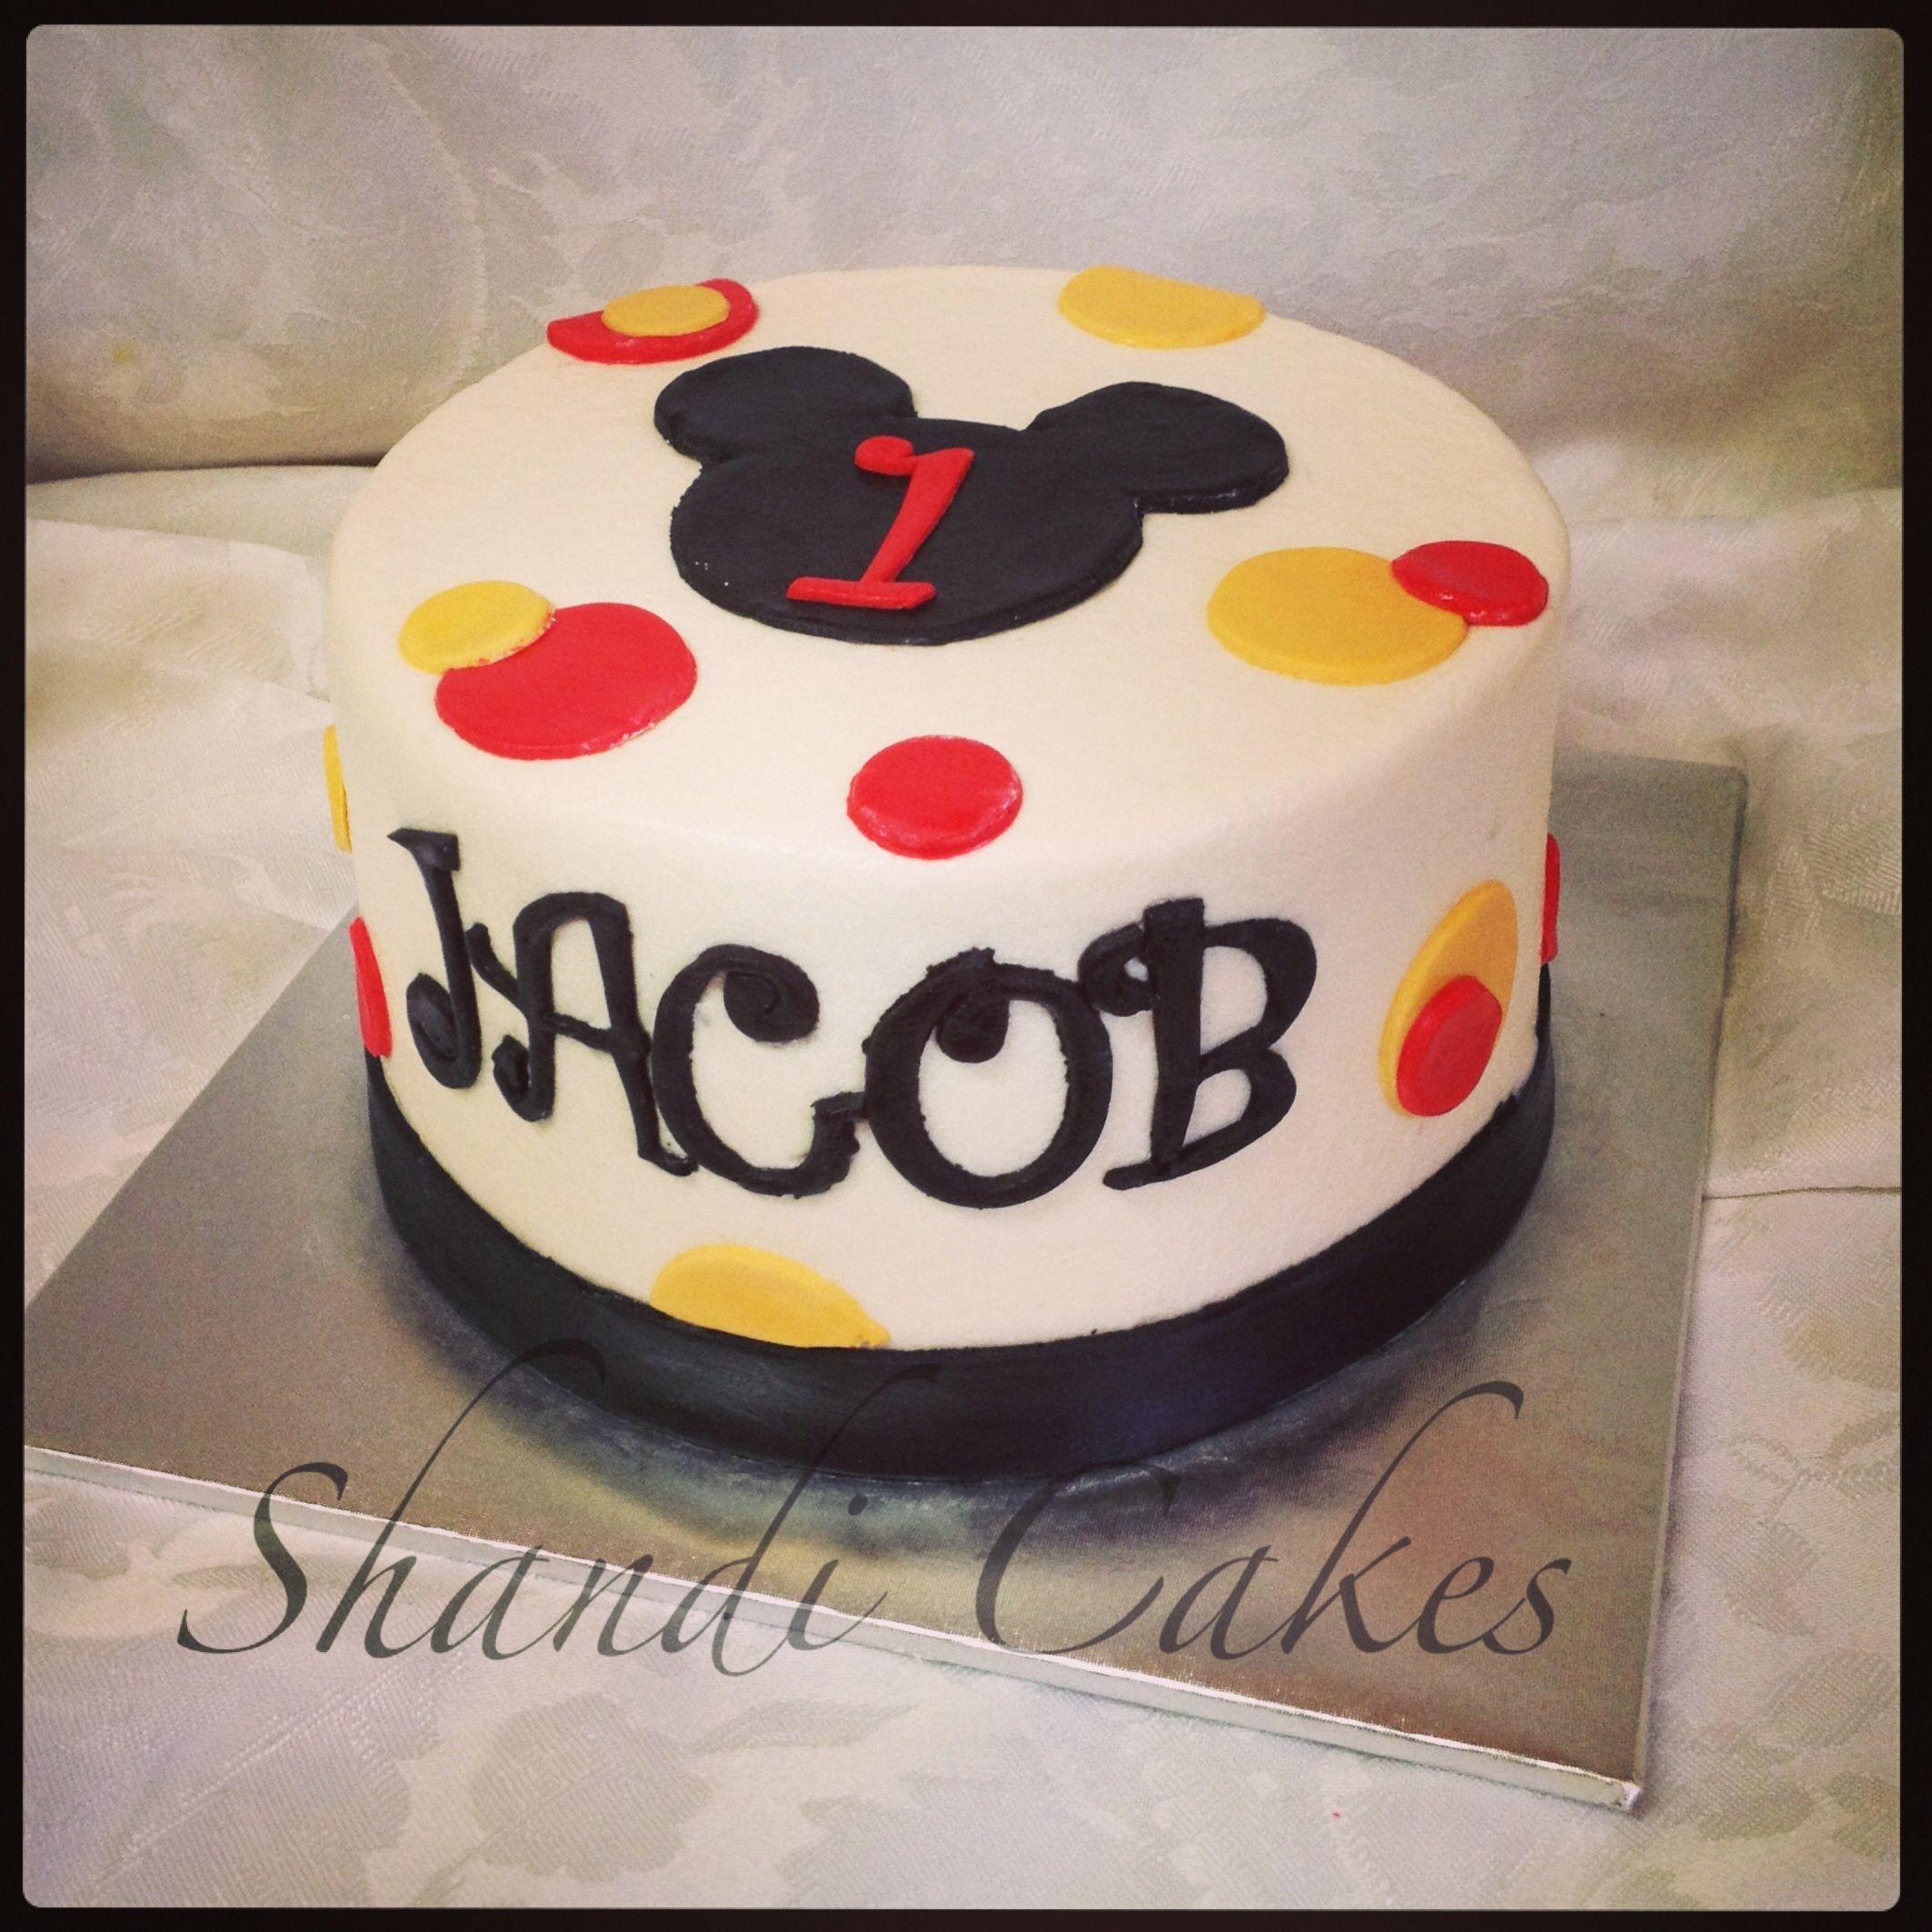 Mickey Mouse Smash Cakes Buttercream: Mickey Mouse Cake! By Shandi Cakesi Would Like One Like